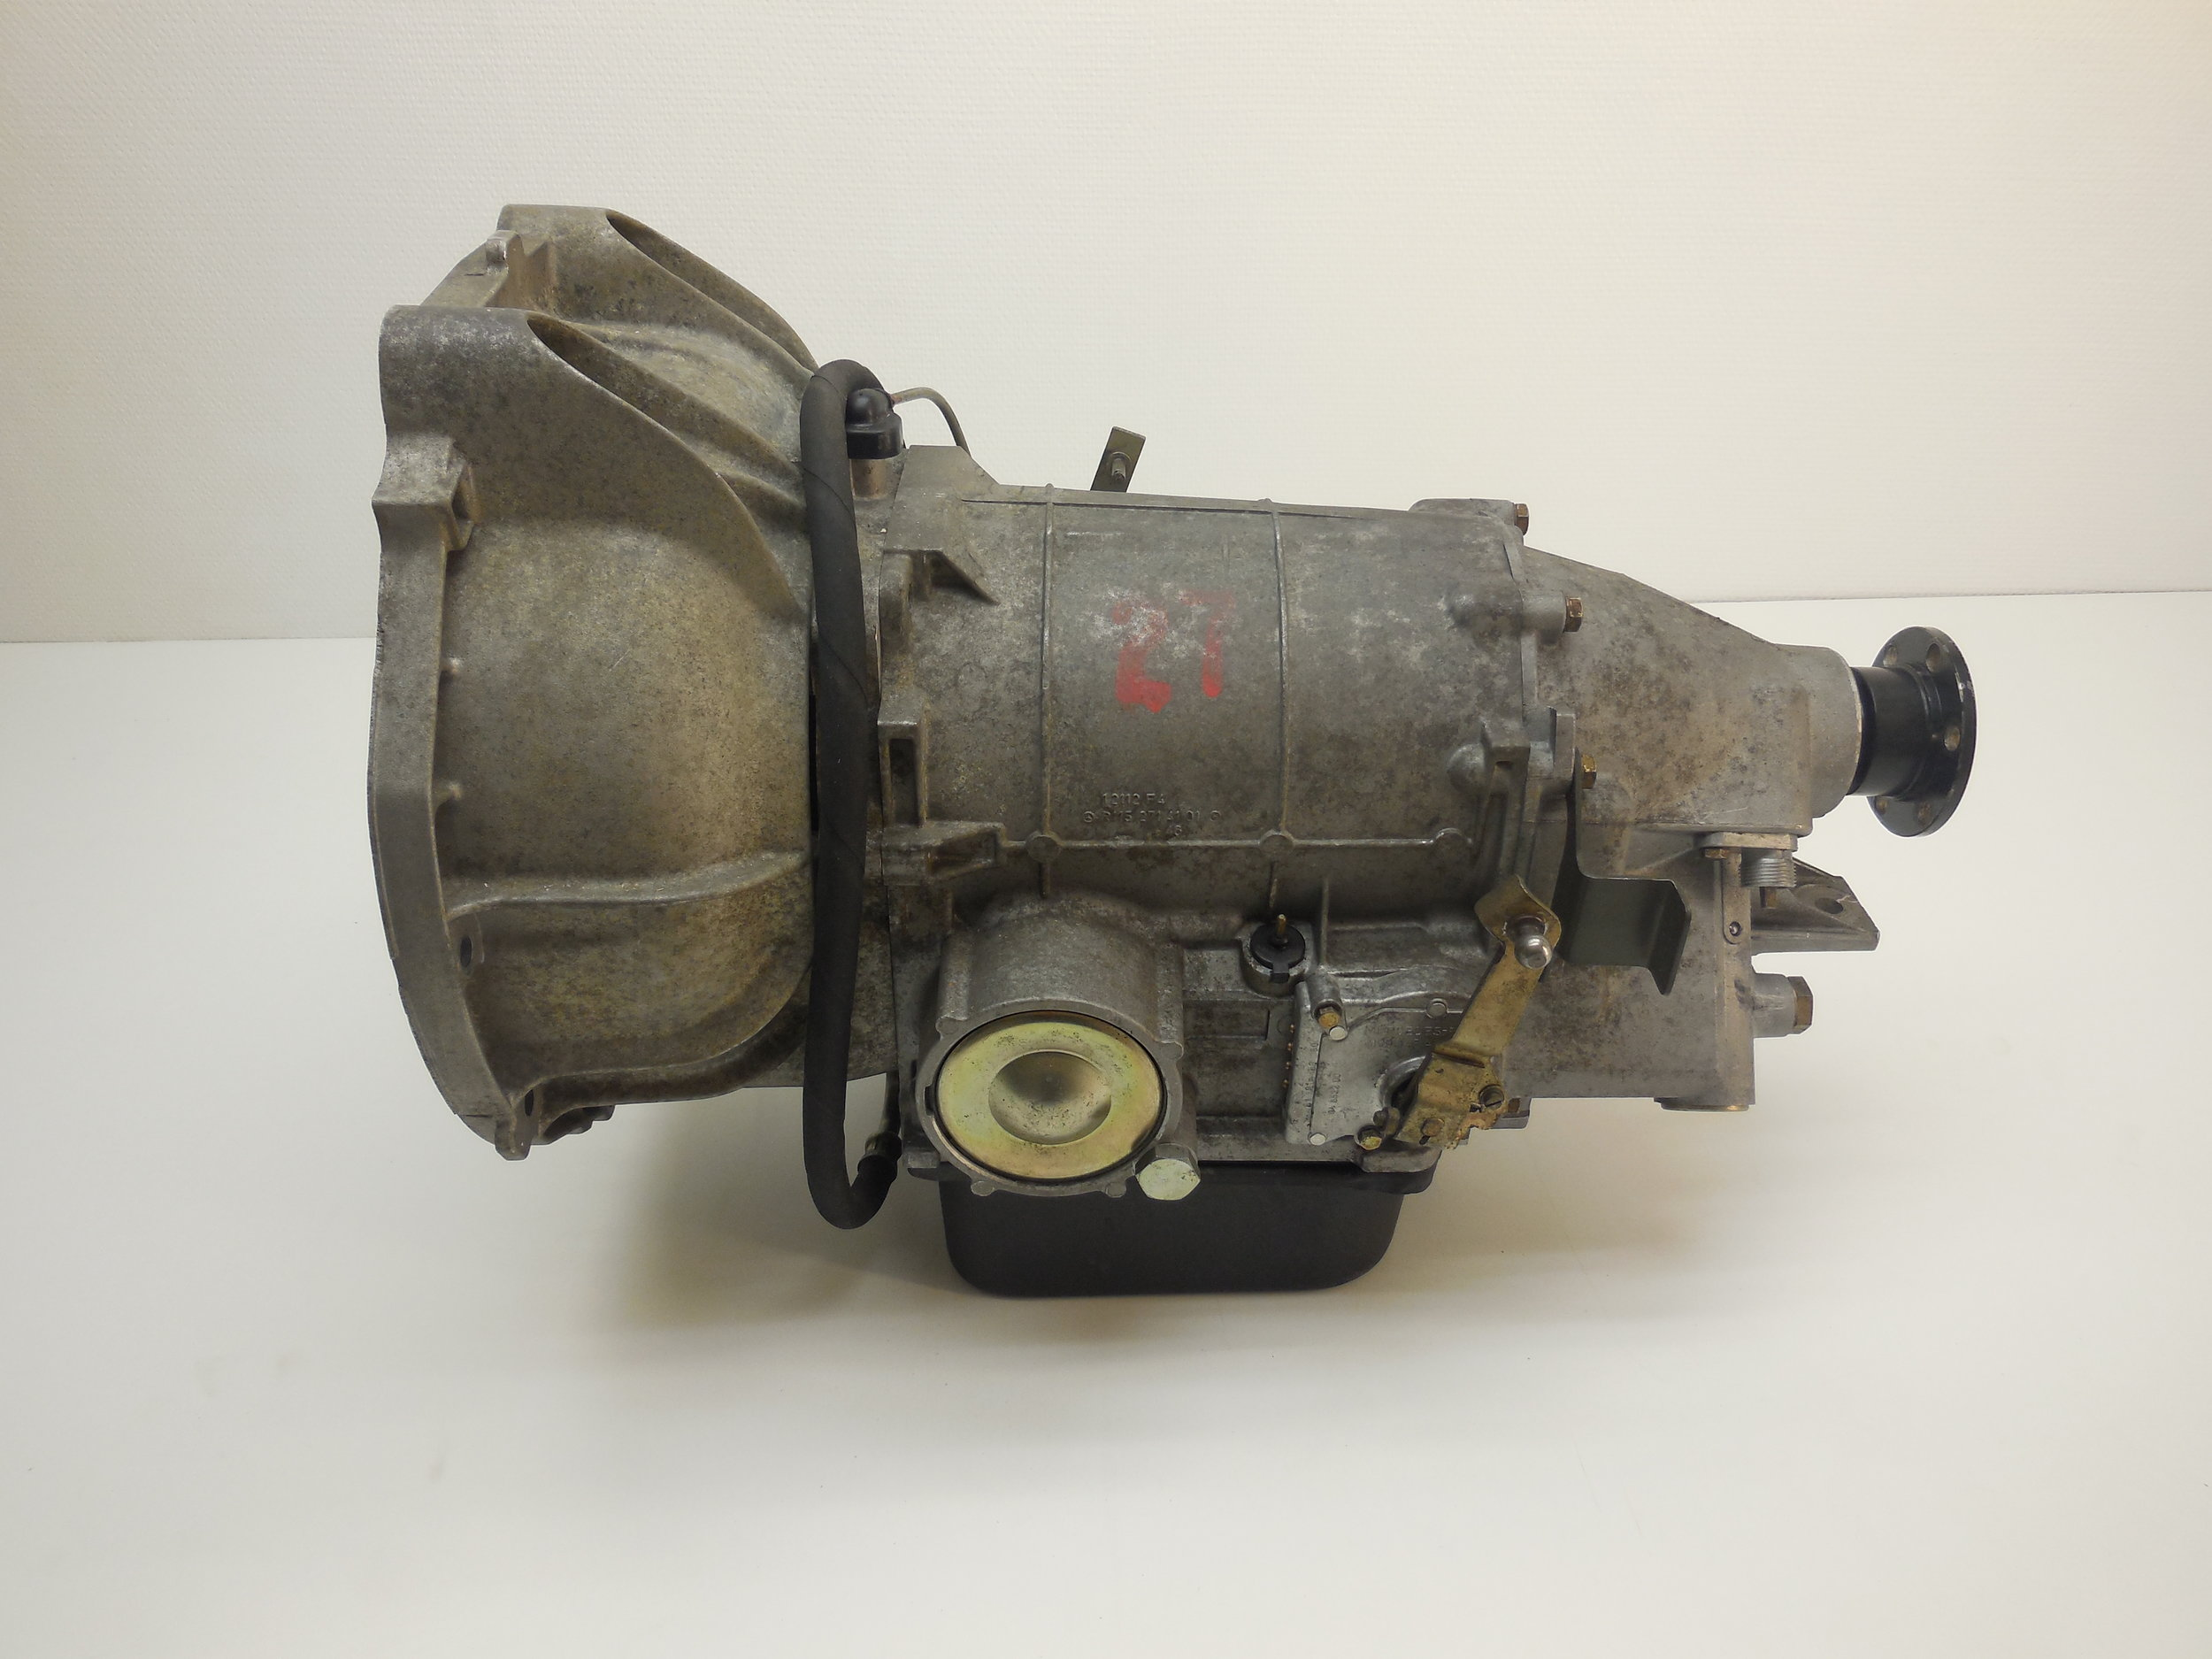 Renovated gear box mb NR: w4a 018 price: 25 000 sek